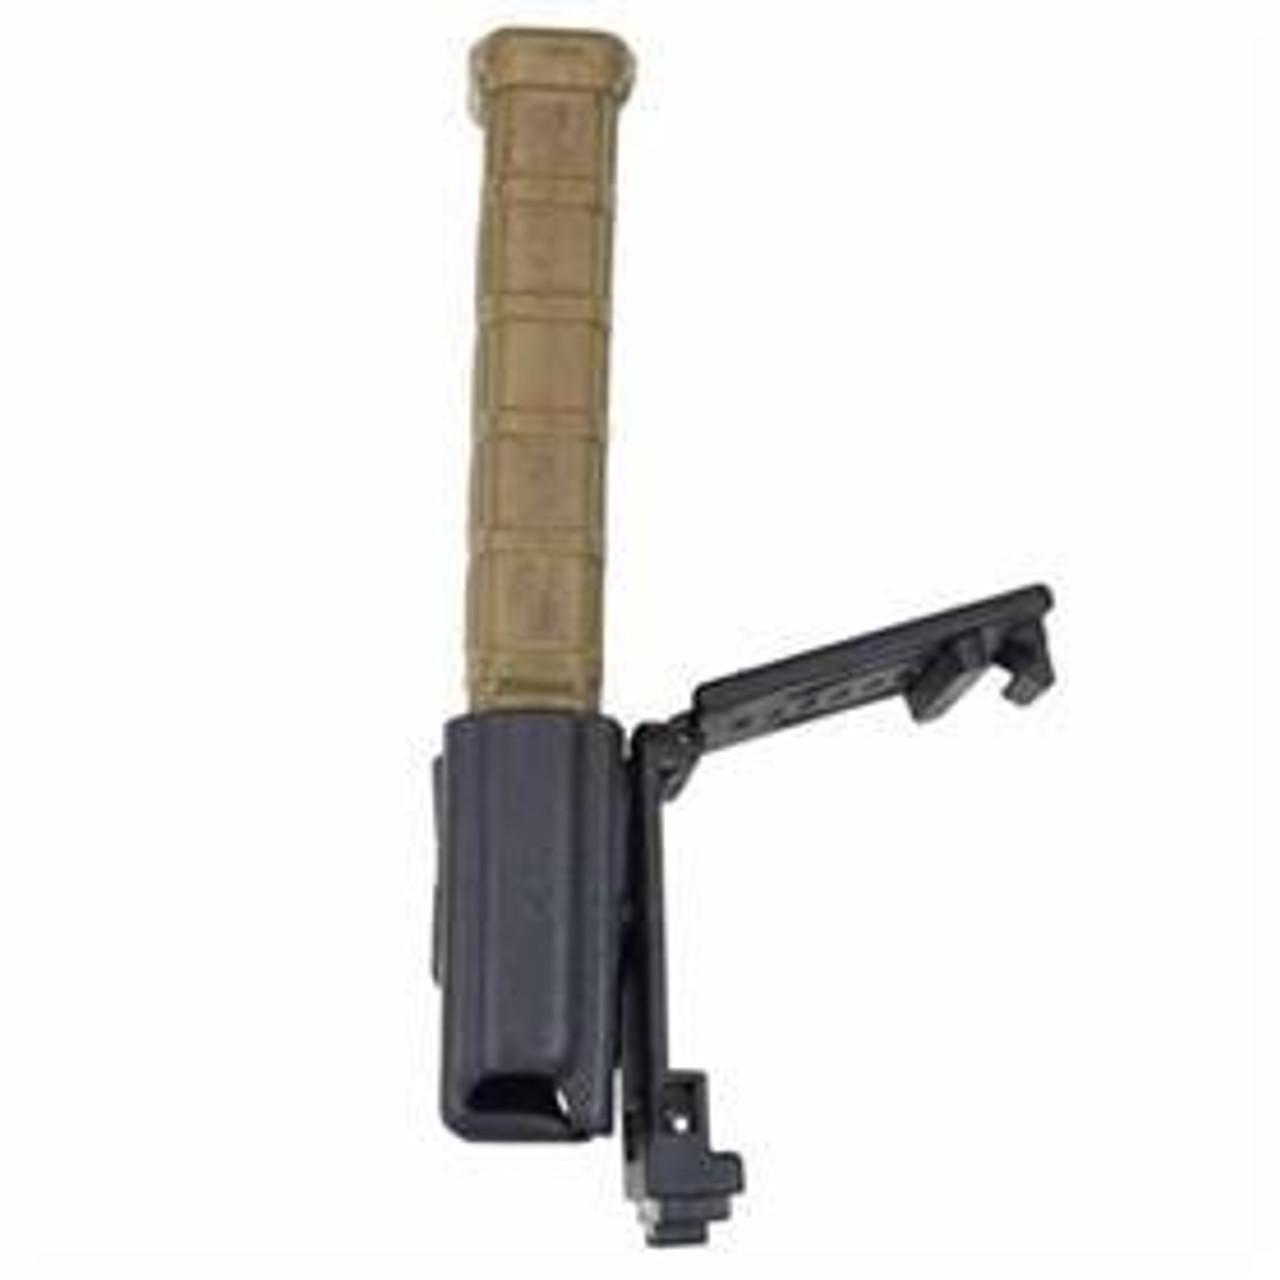 AR 556/223 Mag Pouch PLM   Push Button Locking Mount   Comp-Tac